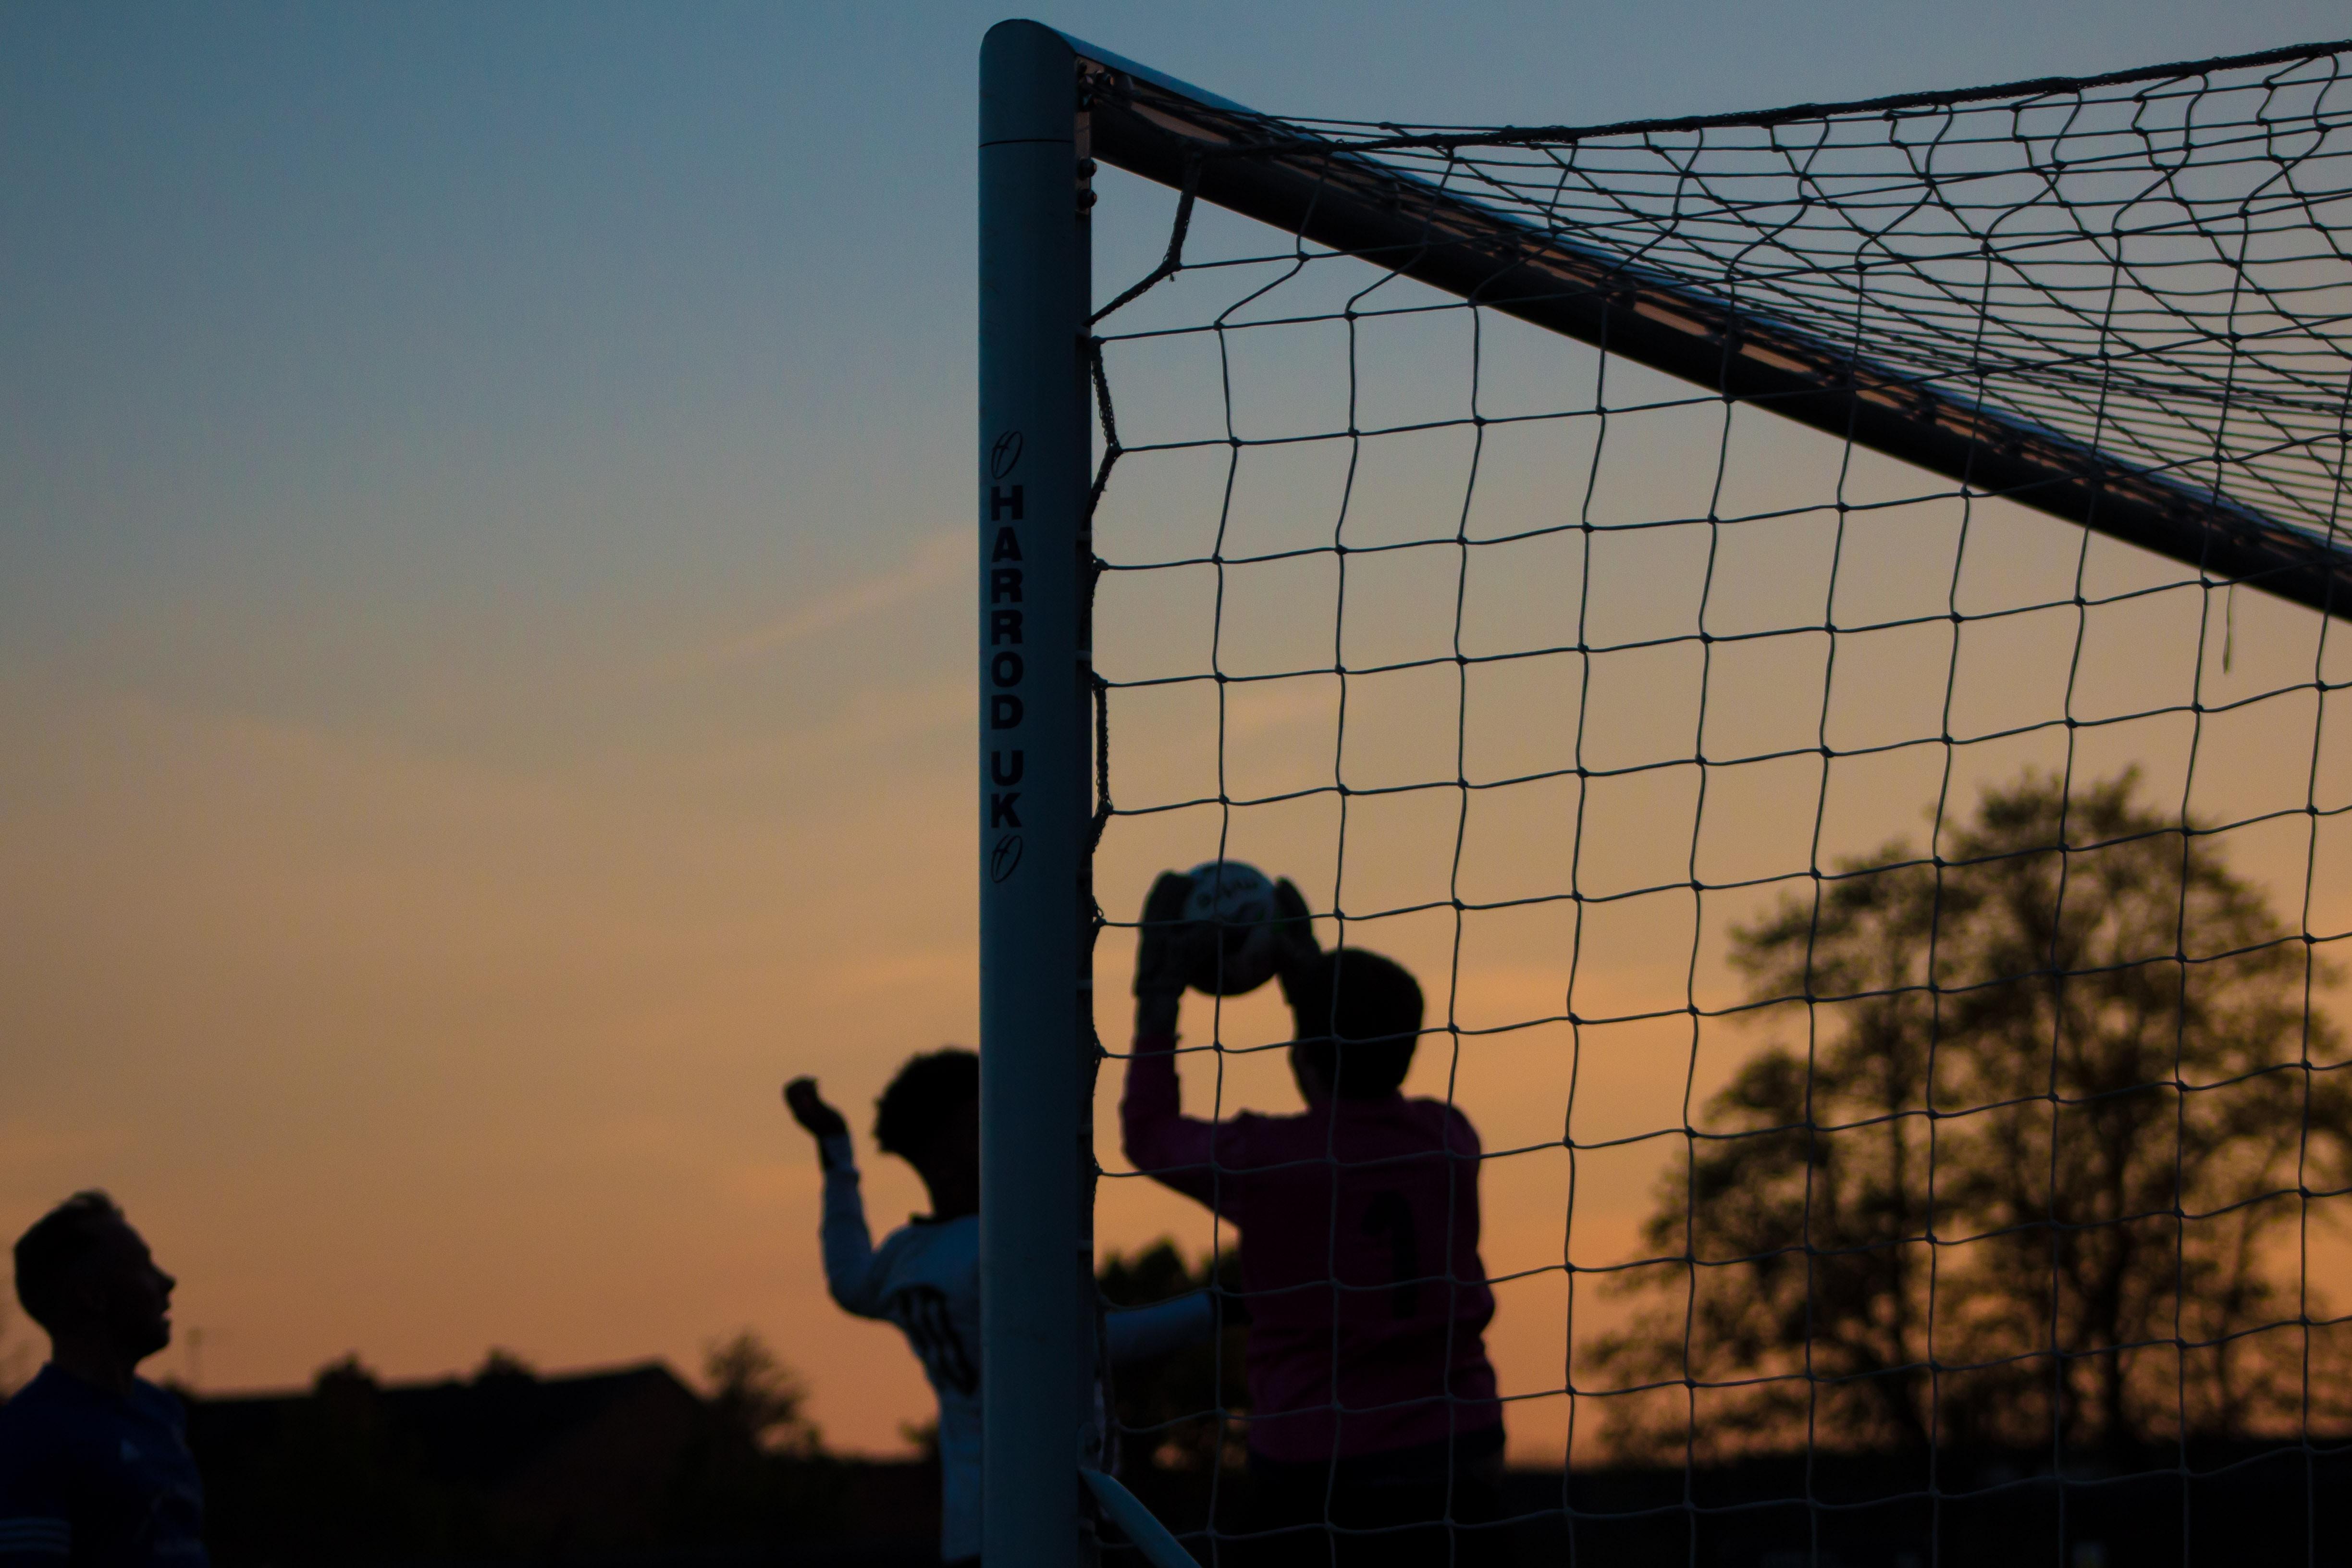 Three children play soccer at sunset at Ewen Fields